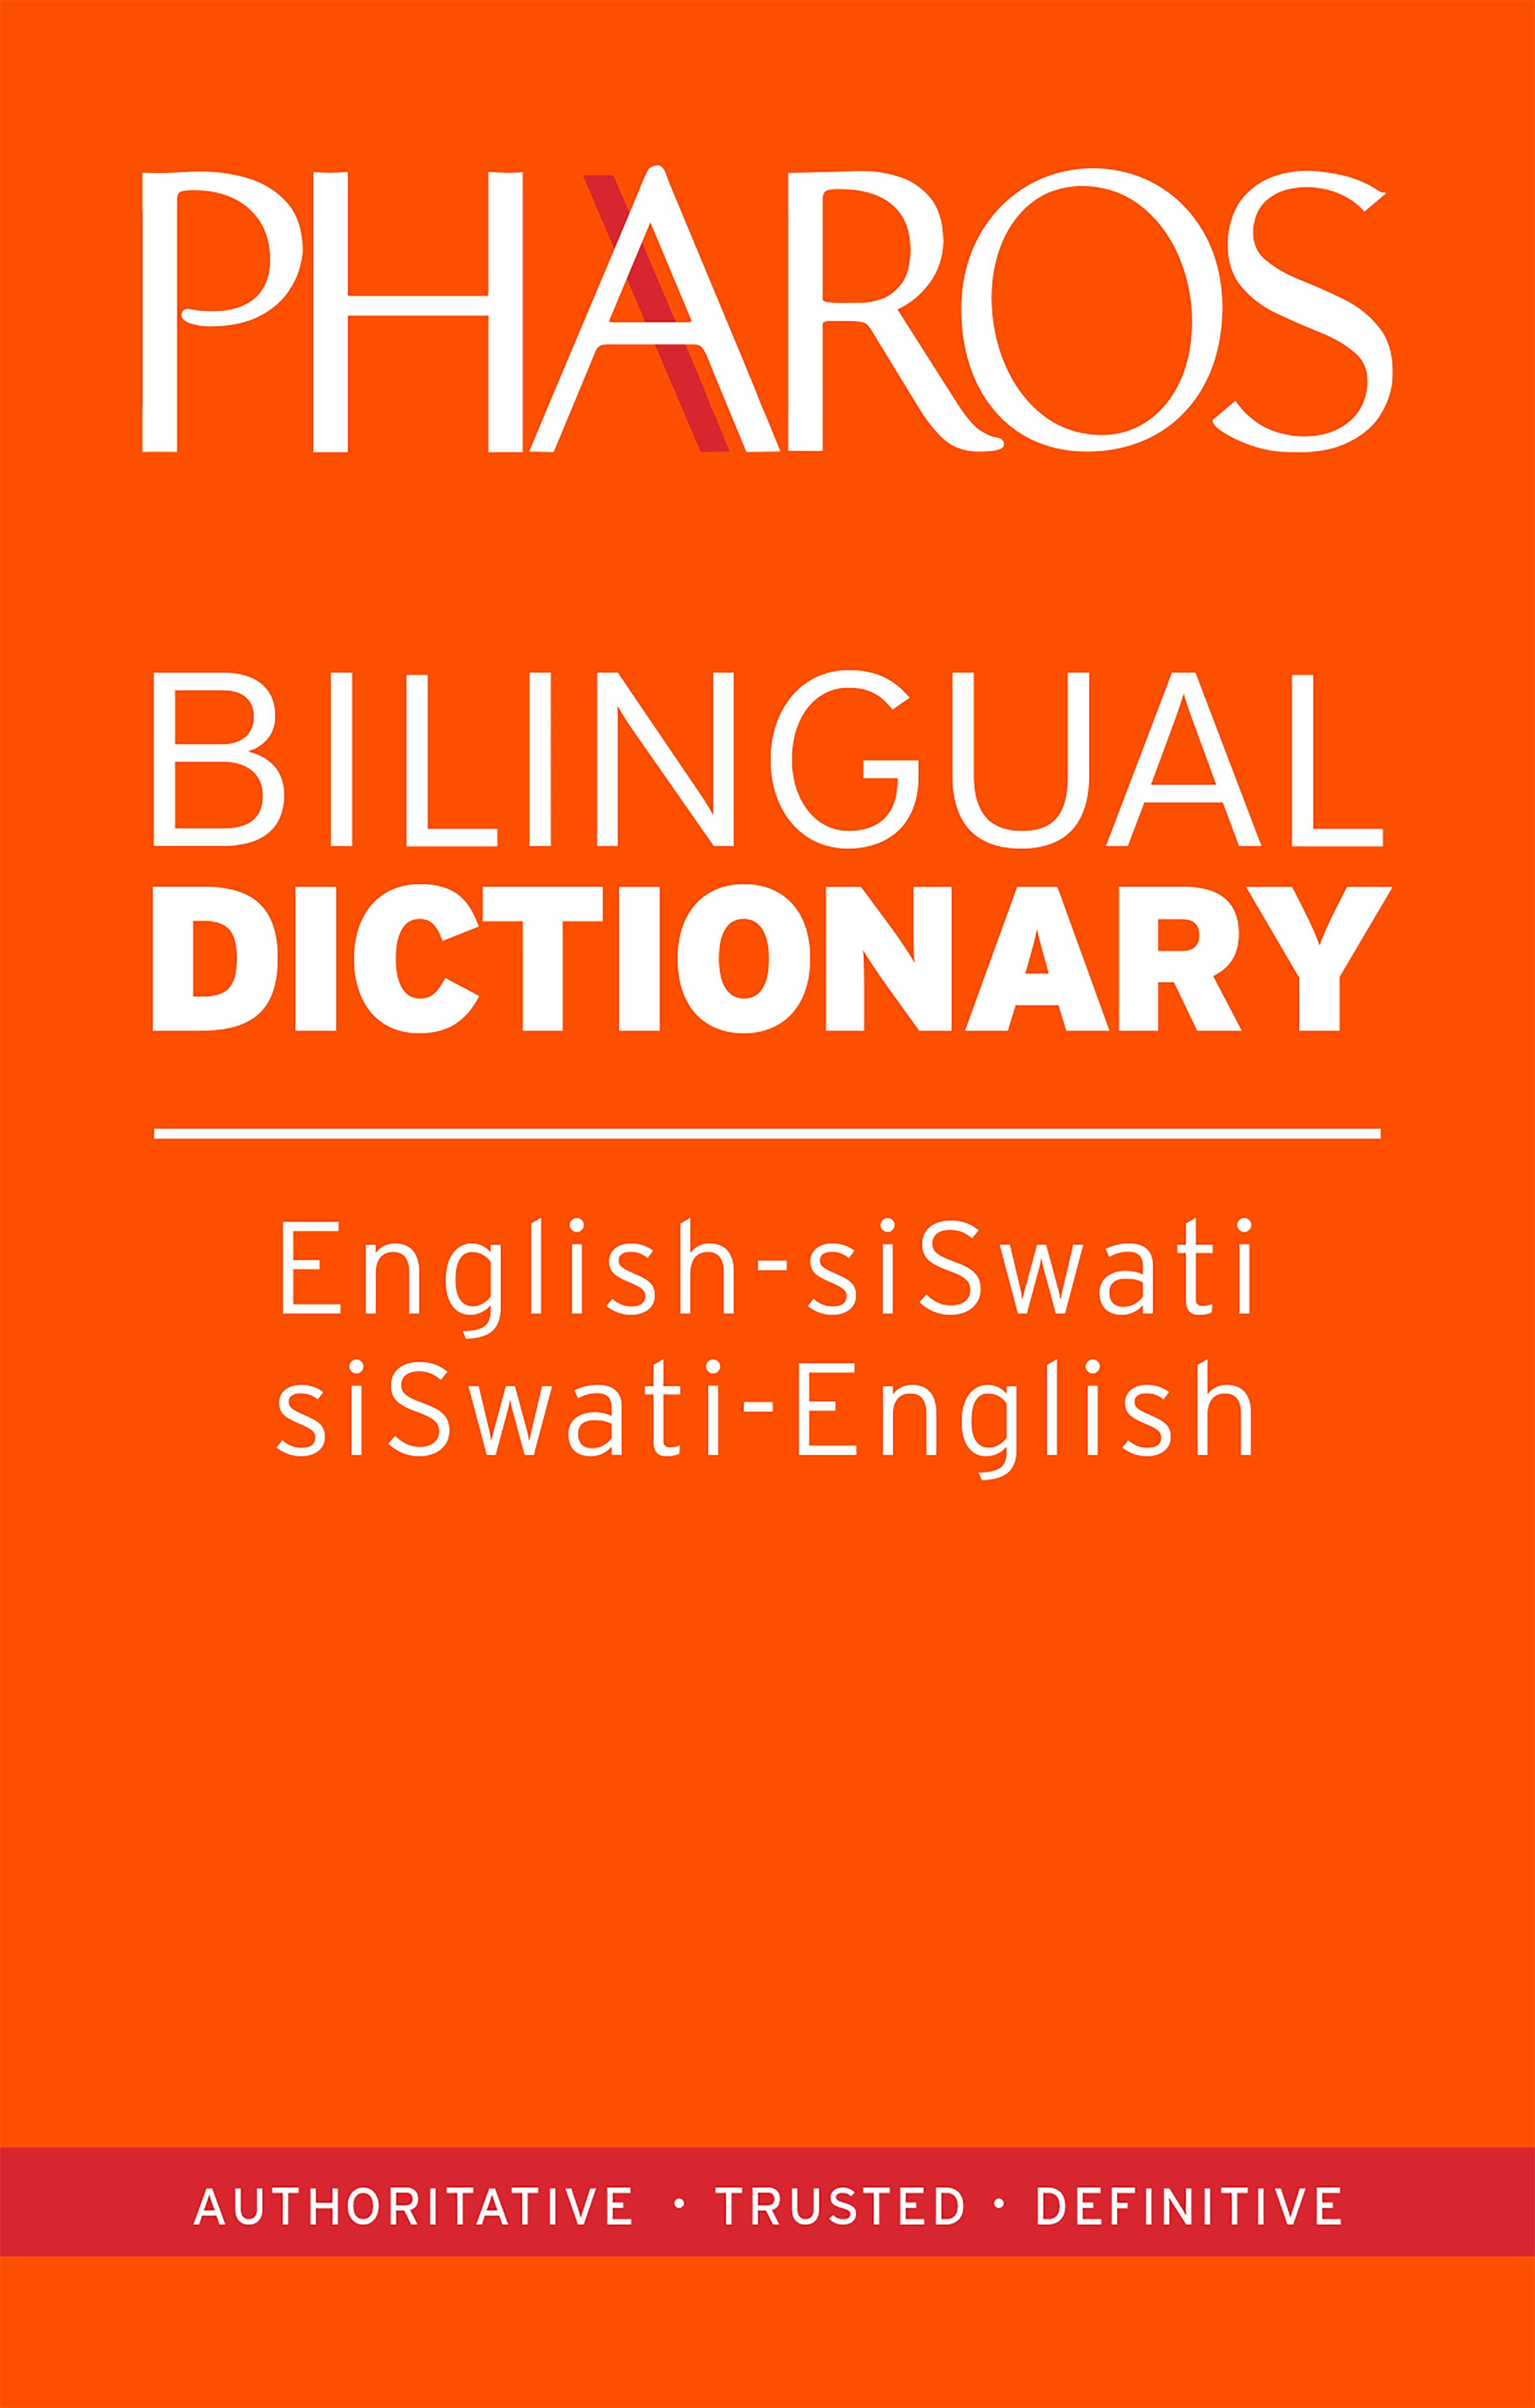 Pharos English-SiSwati/SiSwati-English Bilingual Dictionary